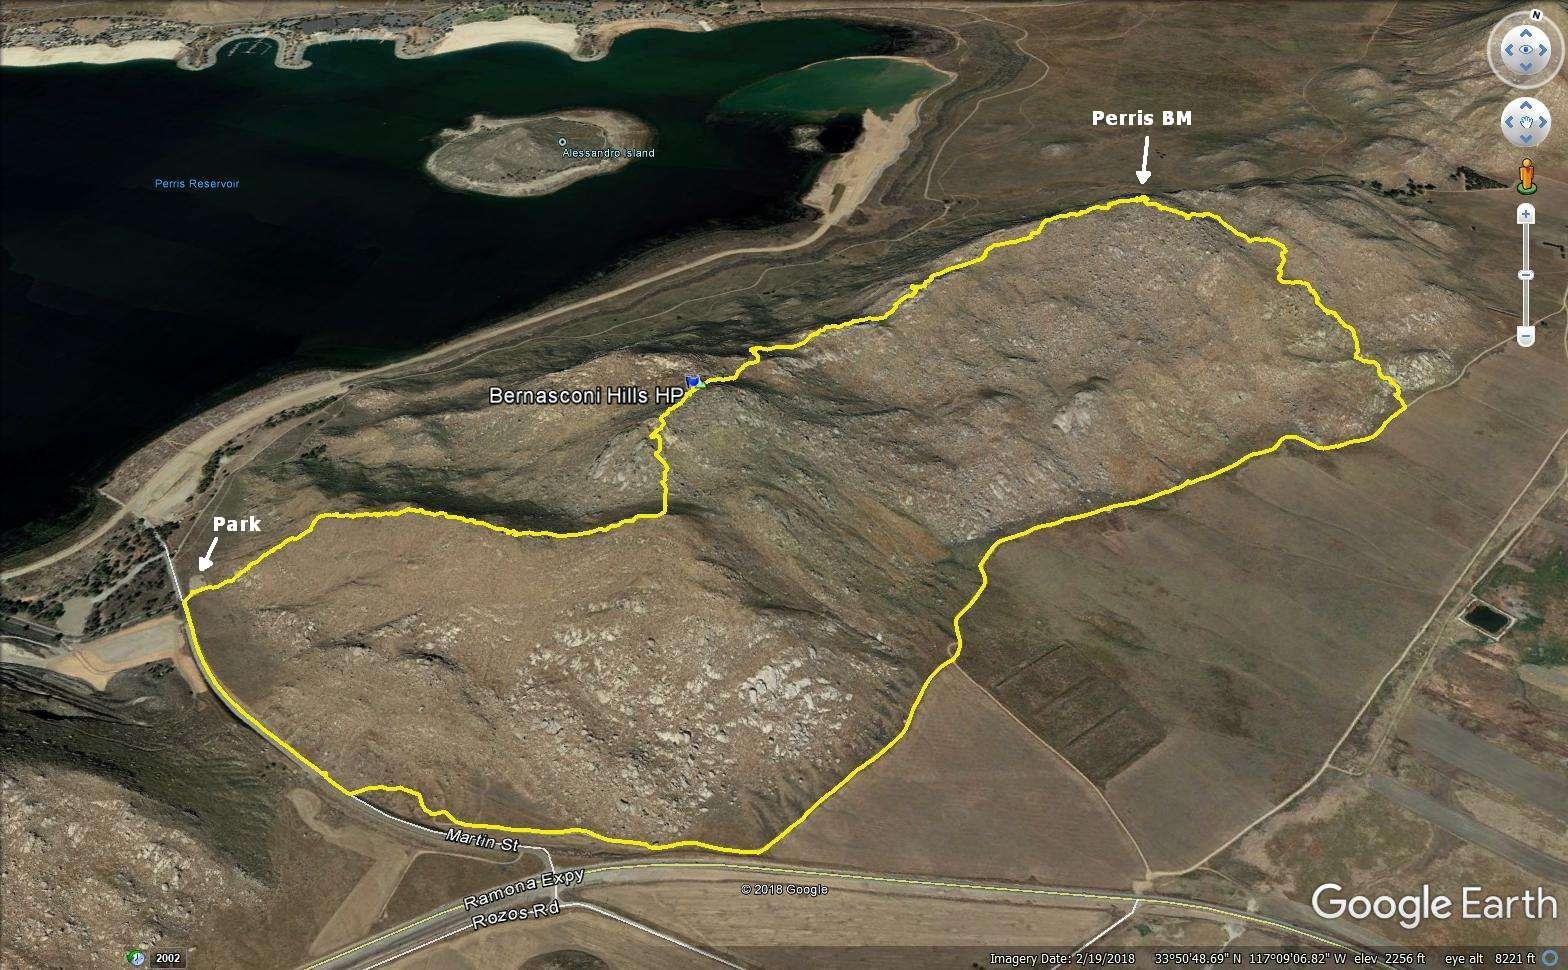 Iron Hiker Bernasconi Hills High Point And Perris Benchmark